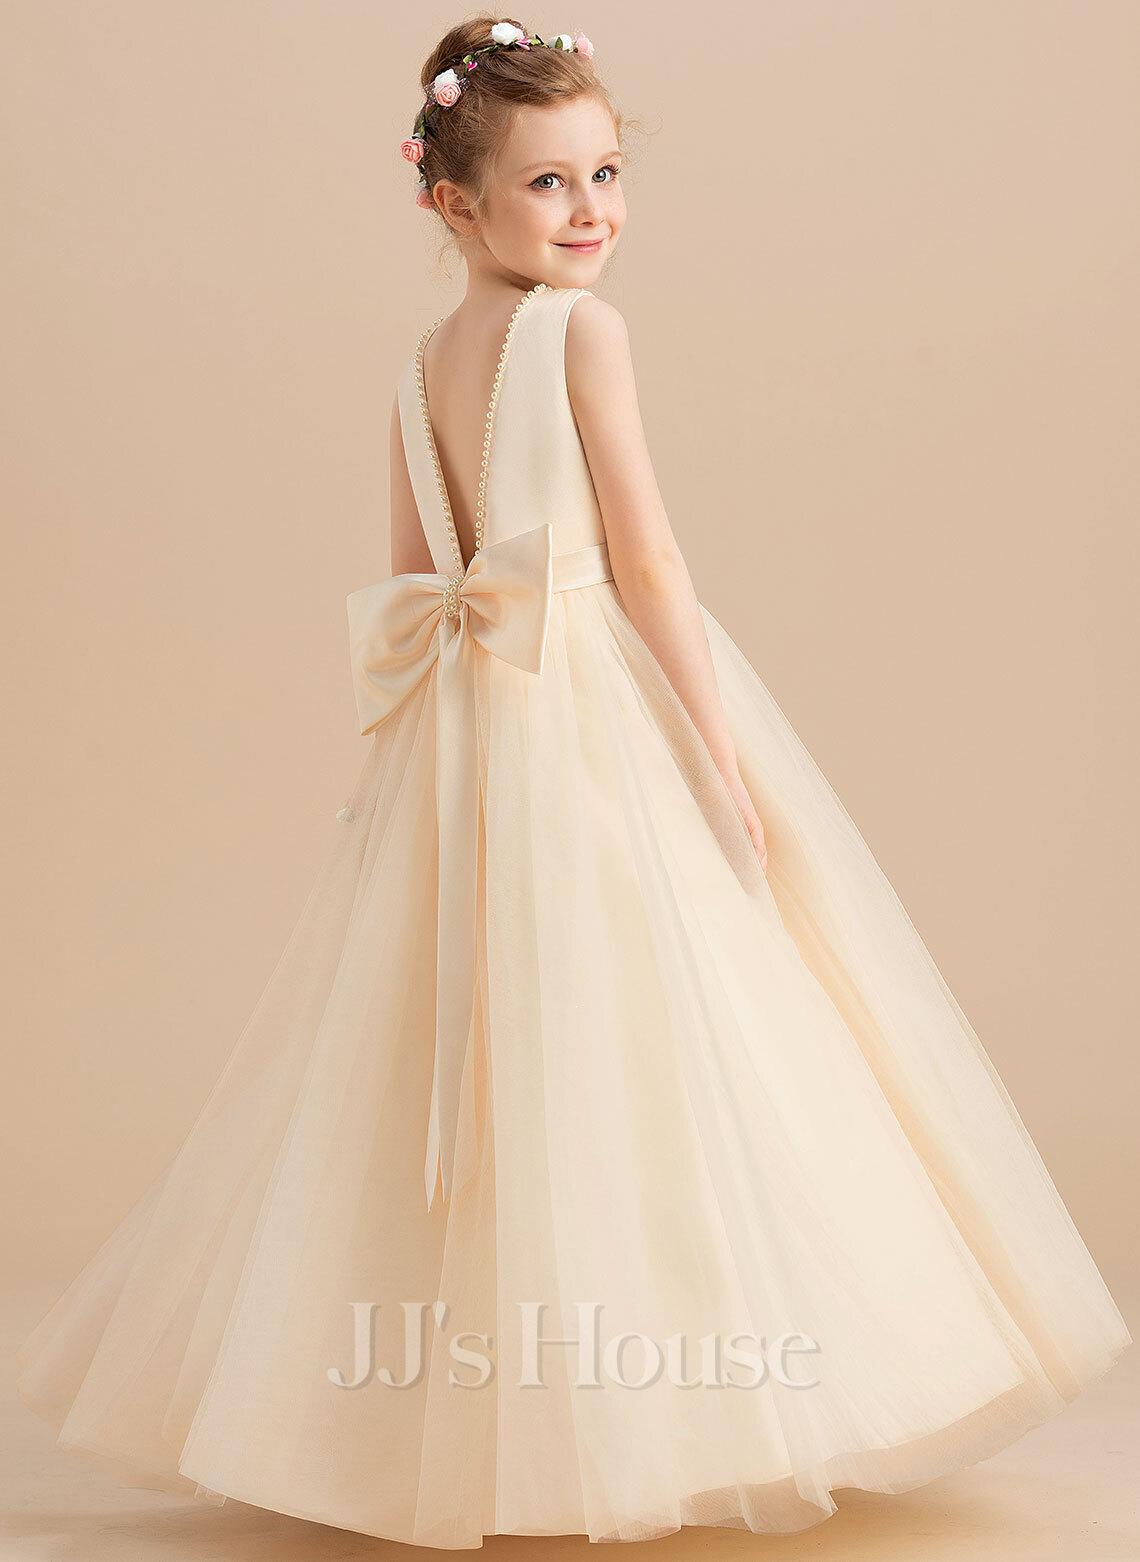 Ball-Gown/Princess Floor-length Flower Girl Dress - Satin/Tulle Sleeveless Scoop Neck With Beading/Bow(s)